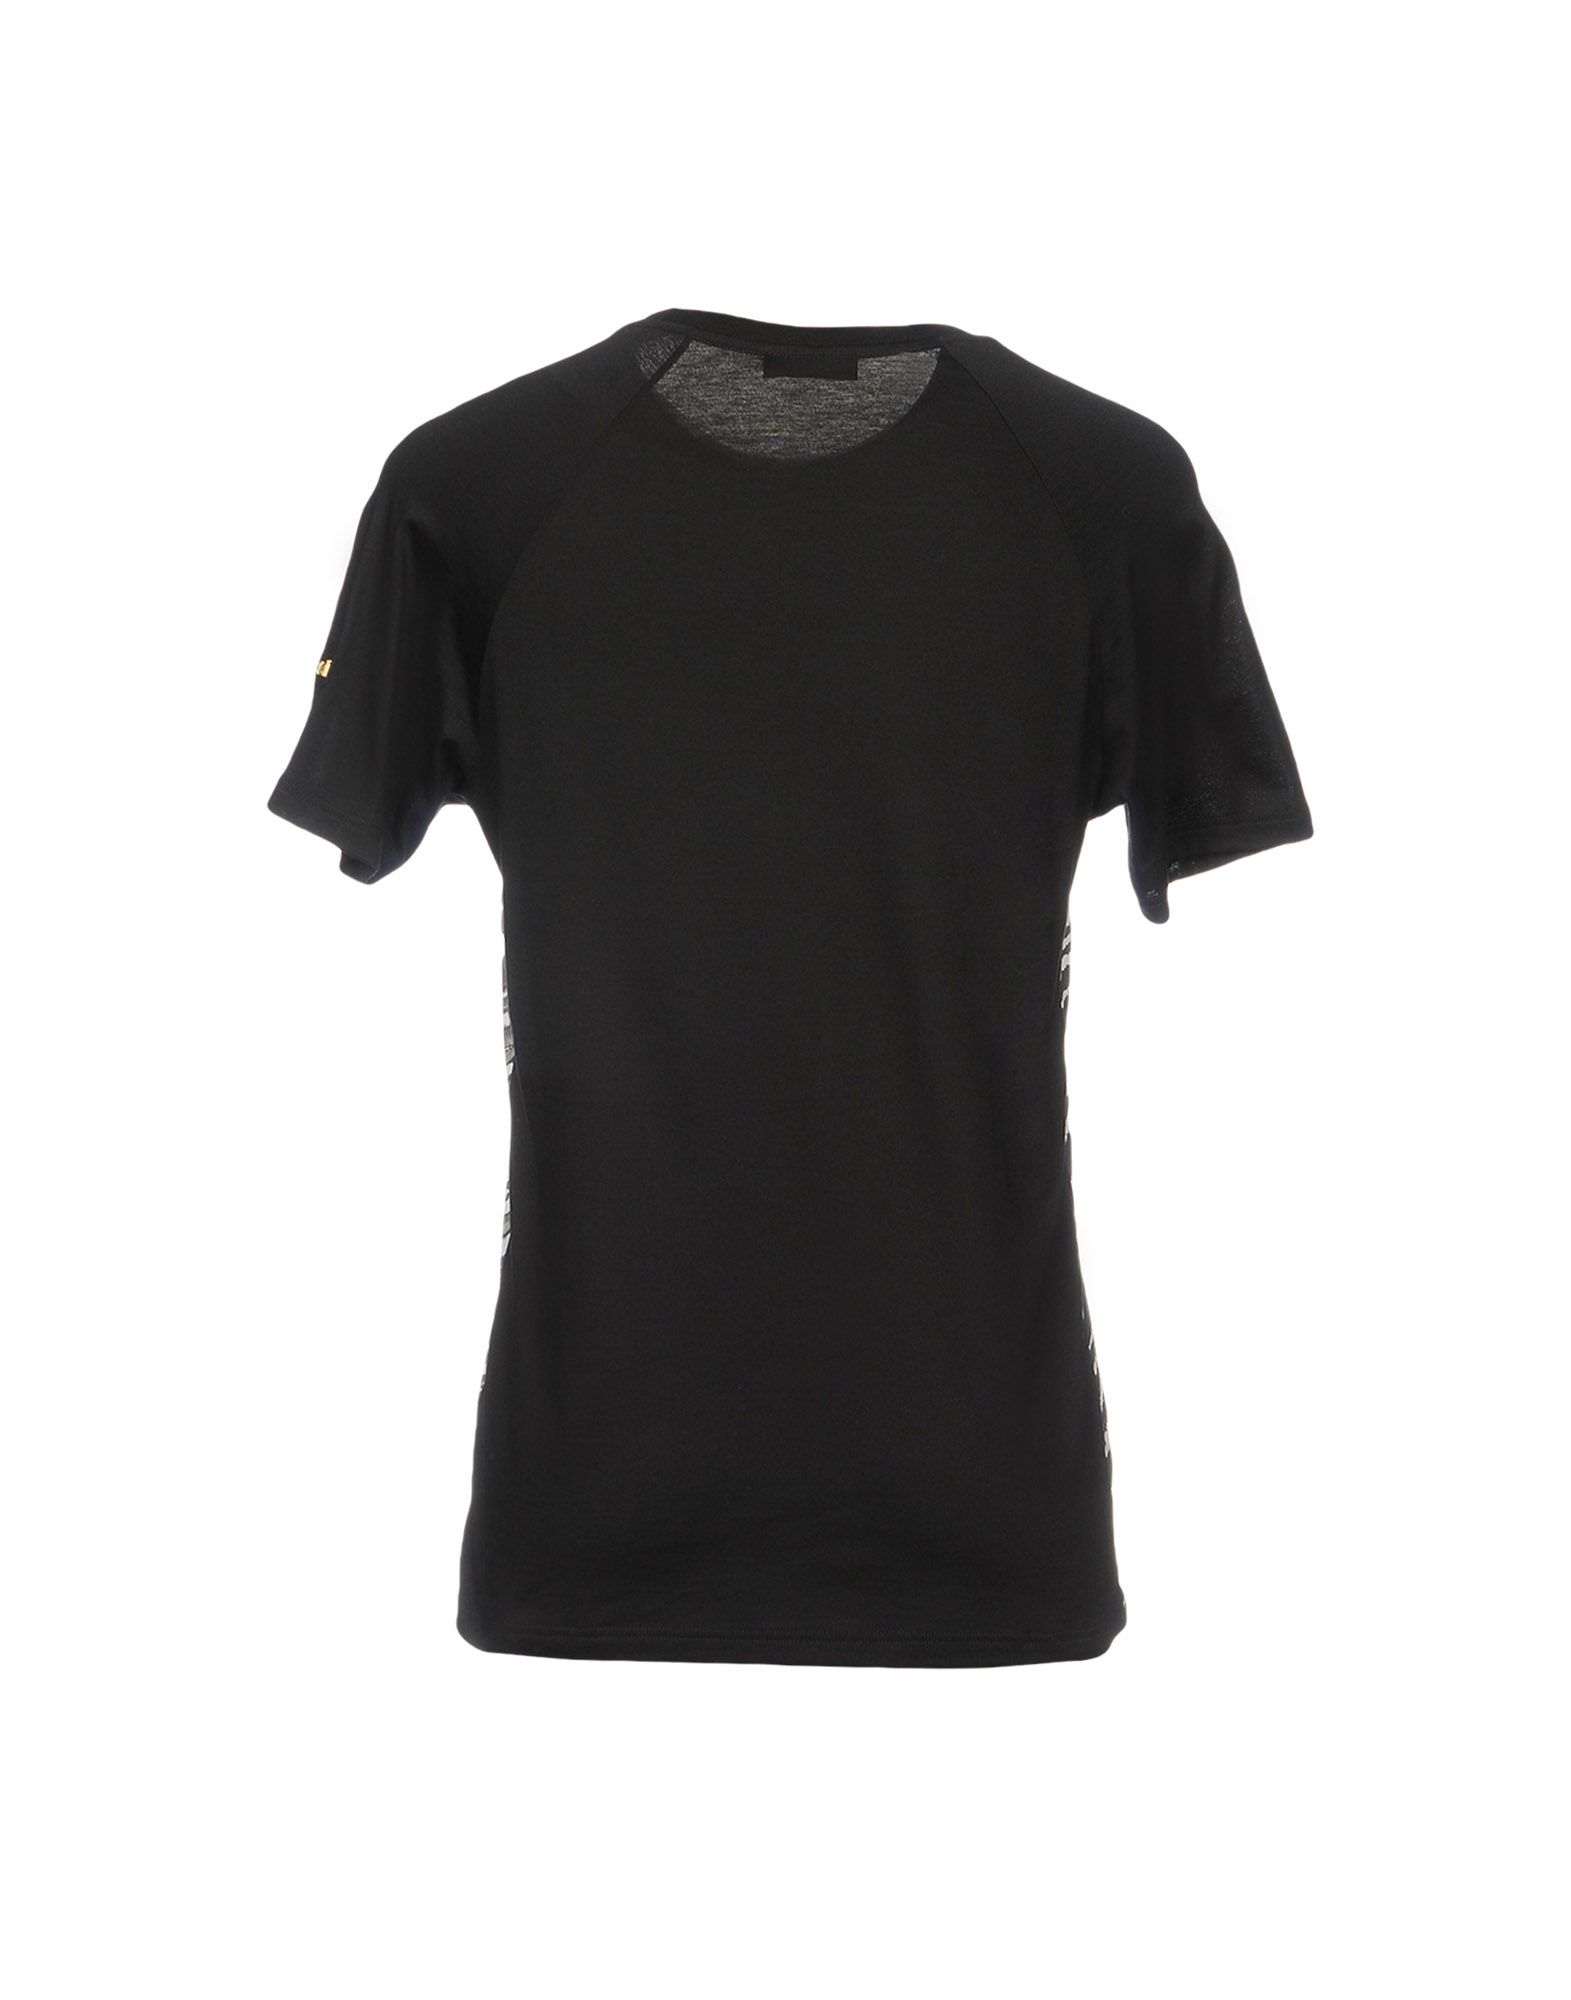 T-Shirt T-Shirt T-Shirt Roberto Cavalli Gym Uomo - 12100078FX 35cdb3